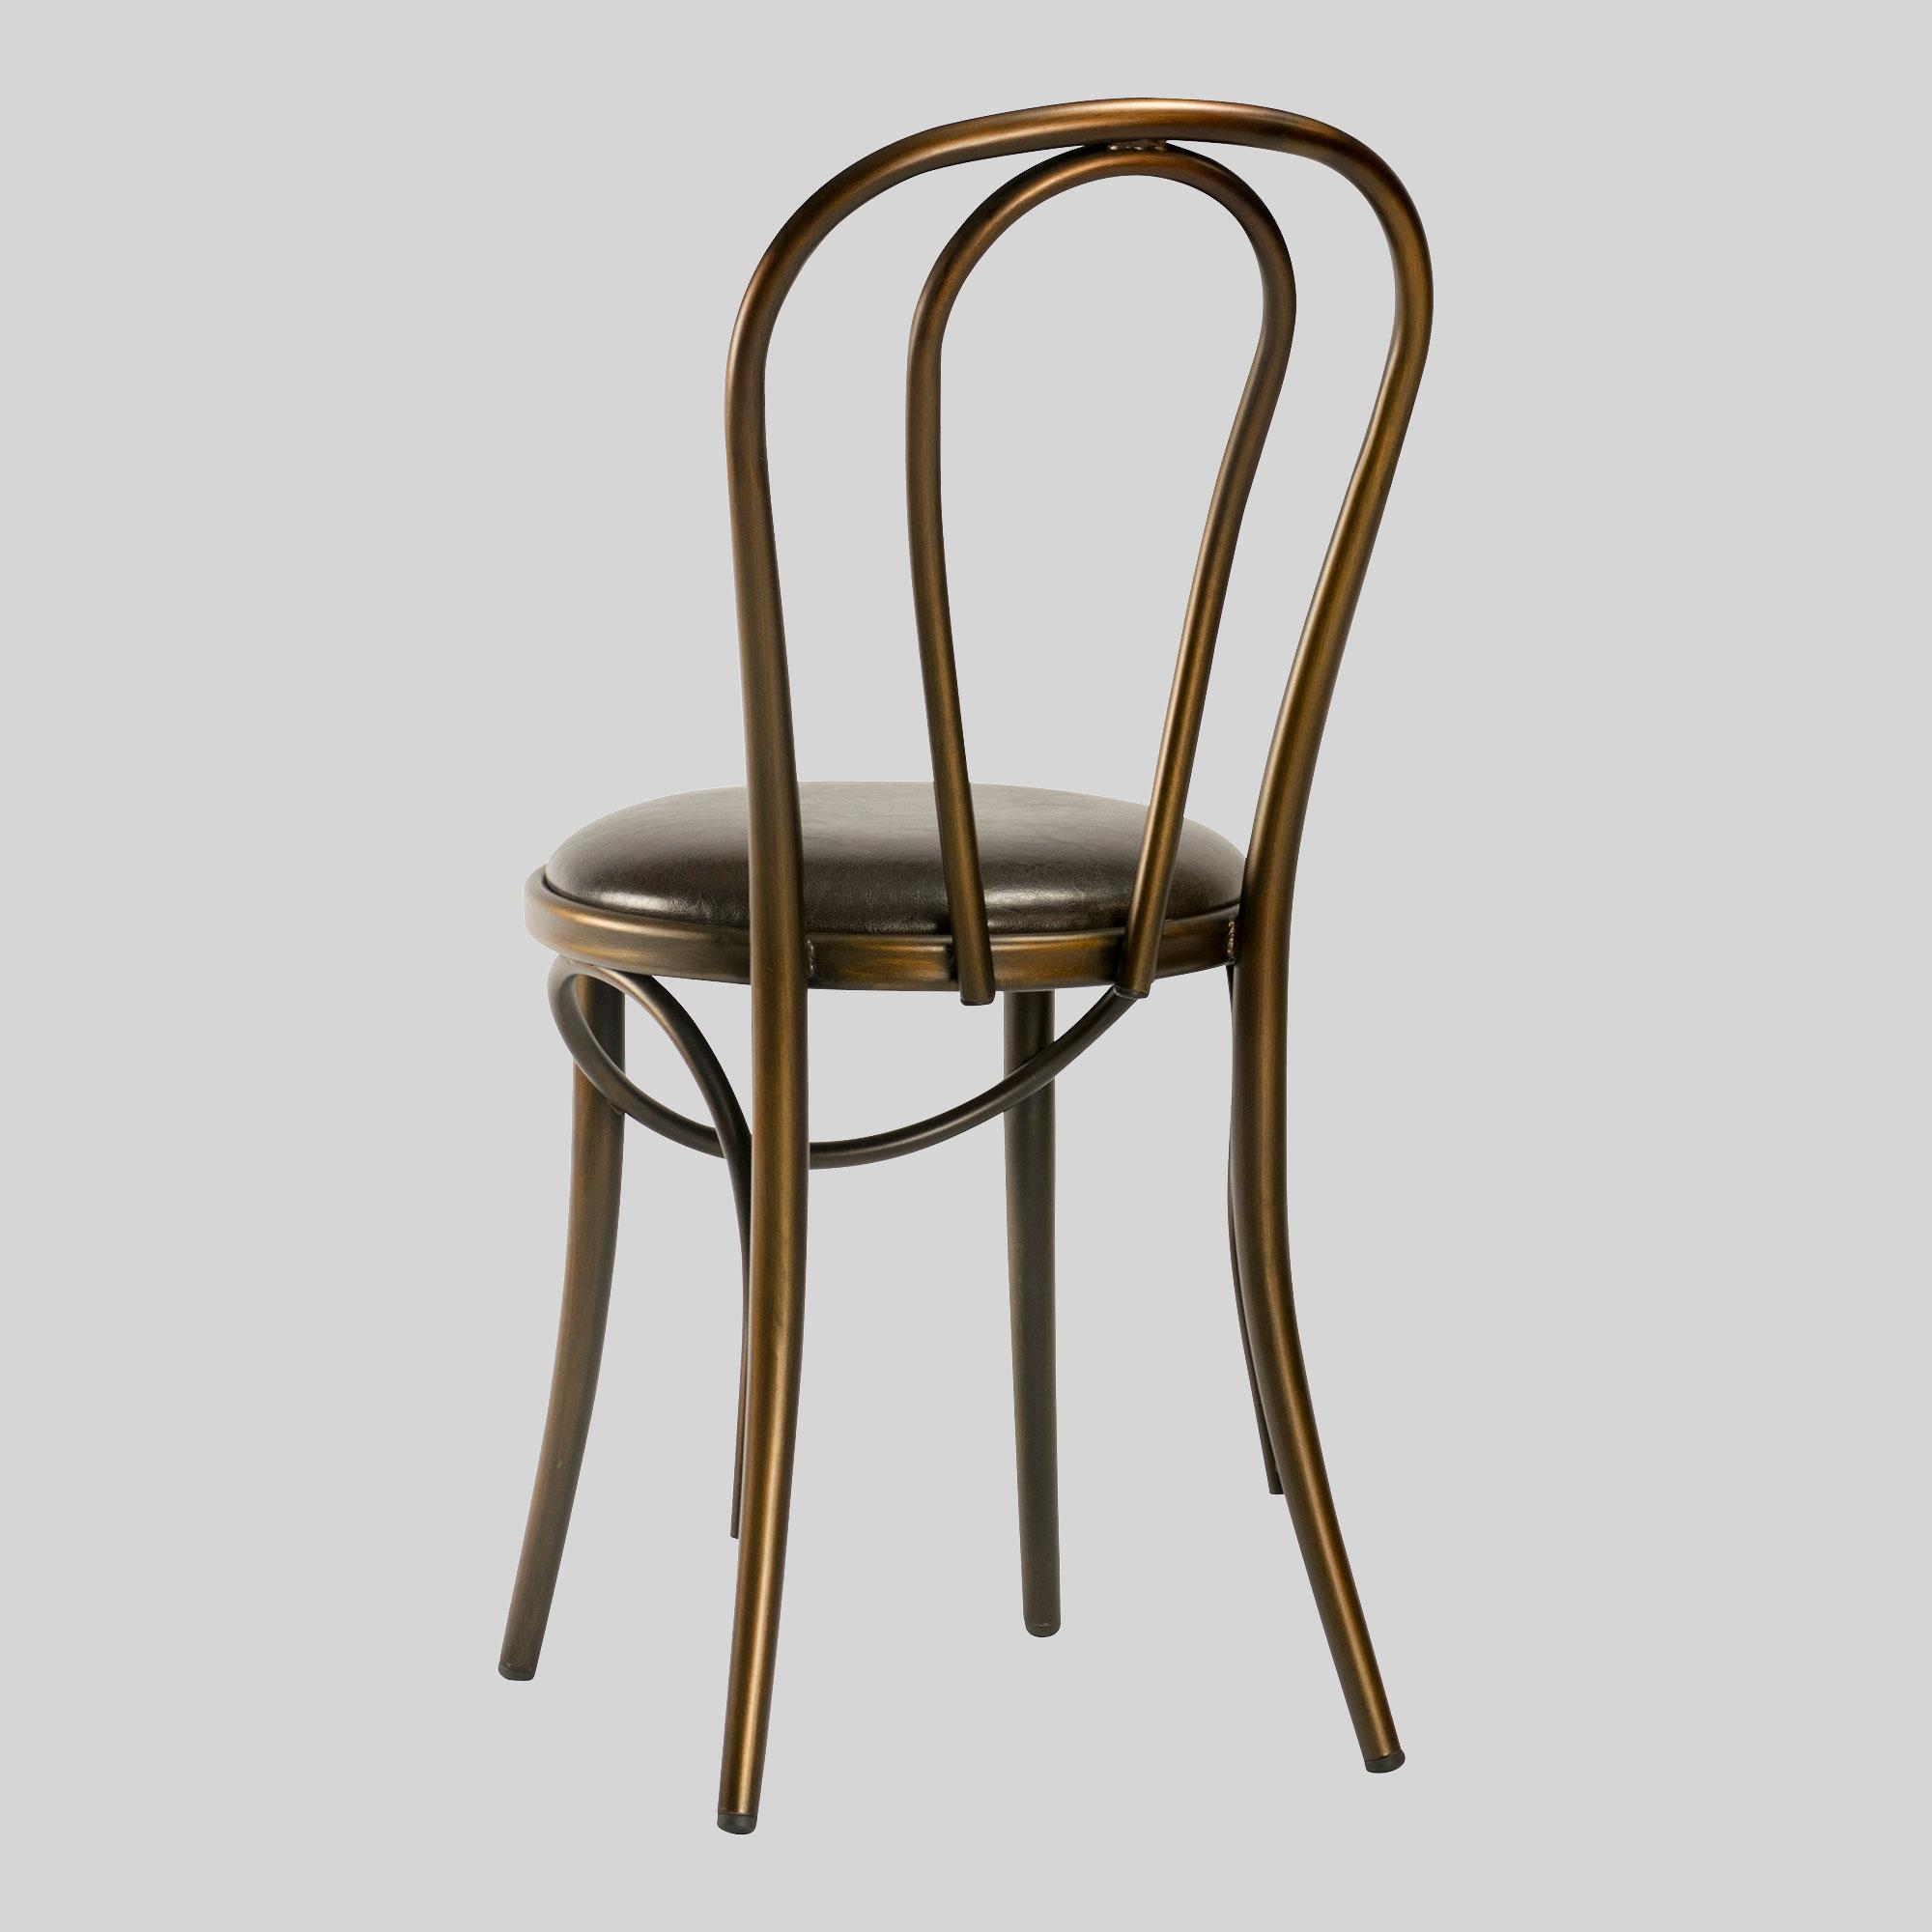 Bentwood bistro chair - Coleman Bistro Bentwood Chair Distressed Copper